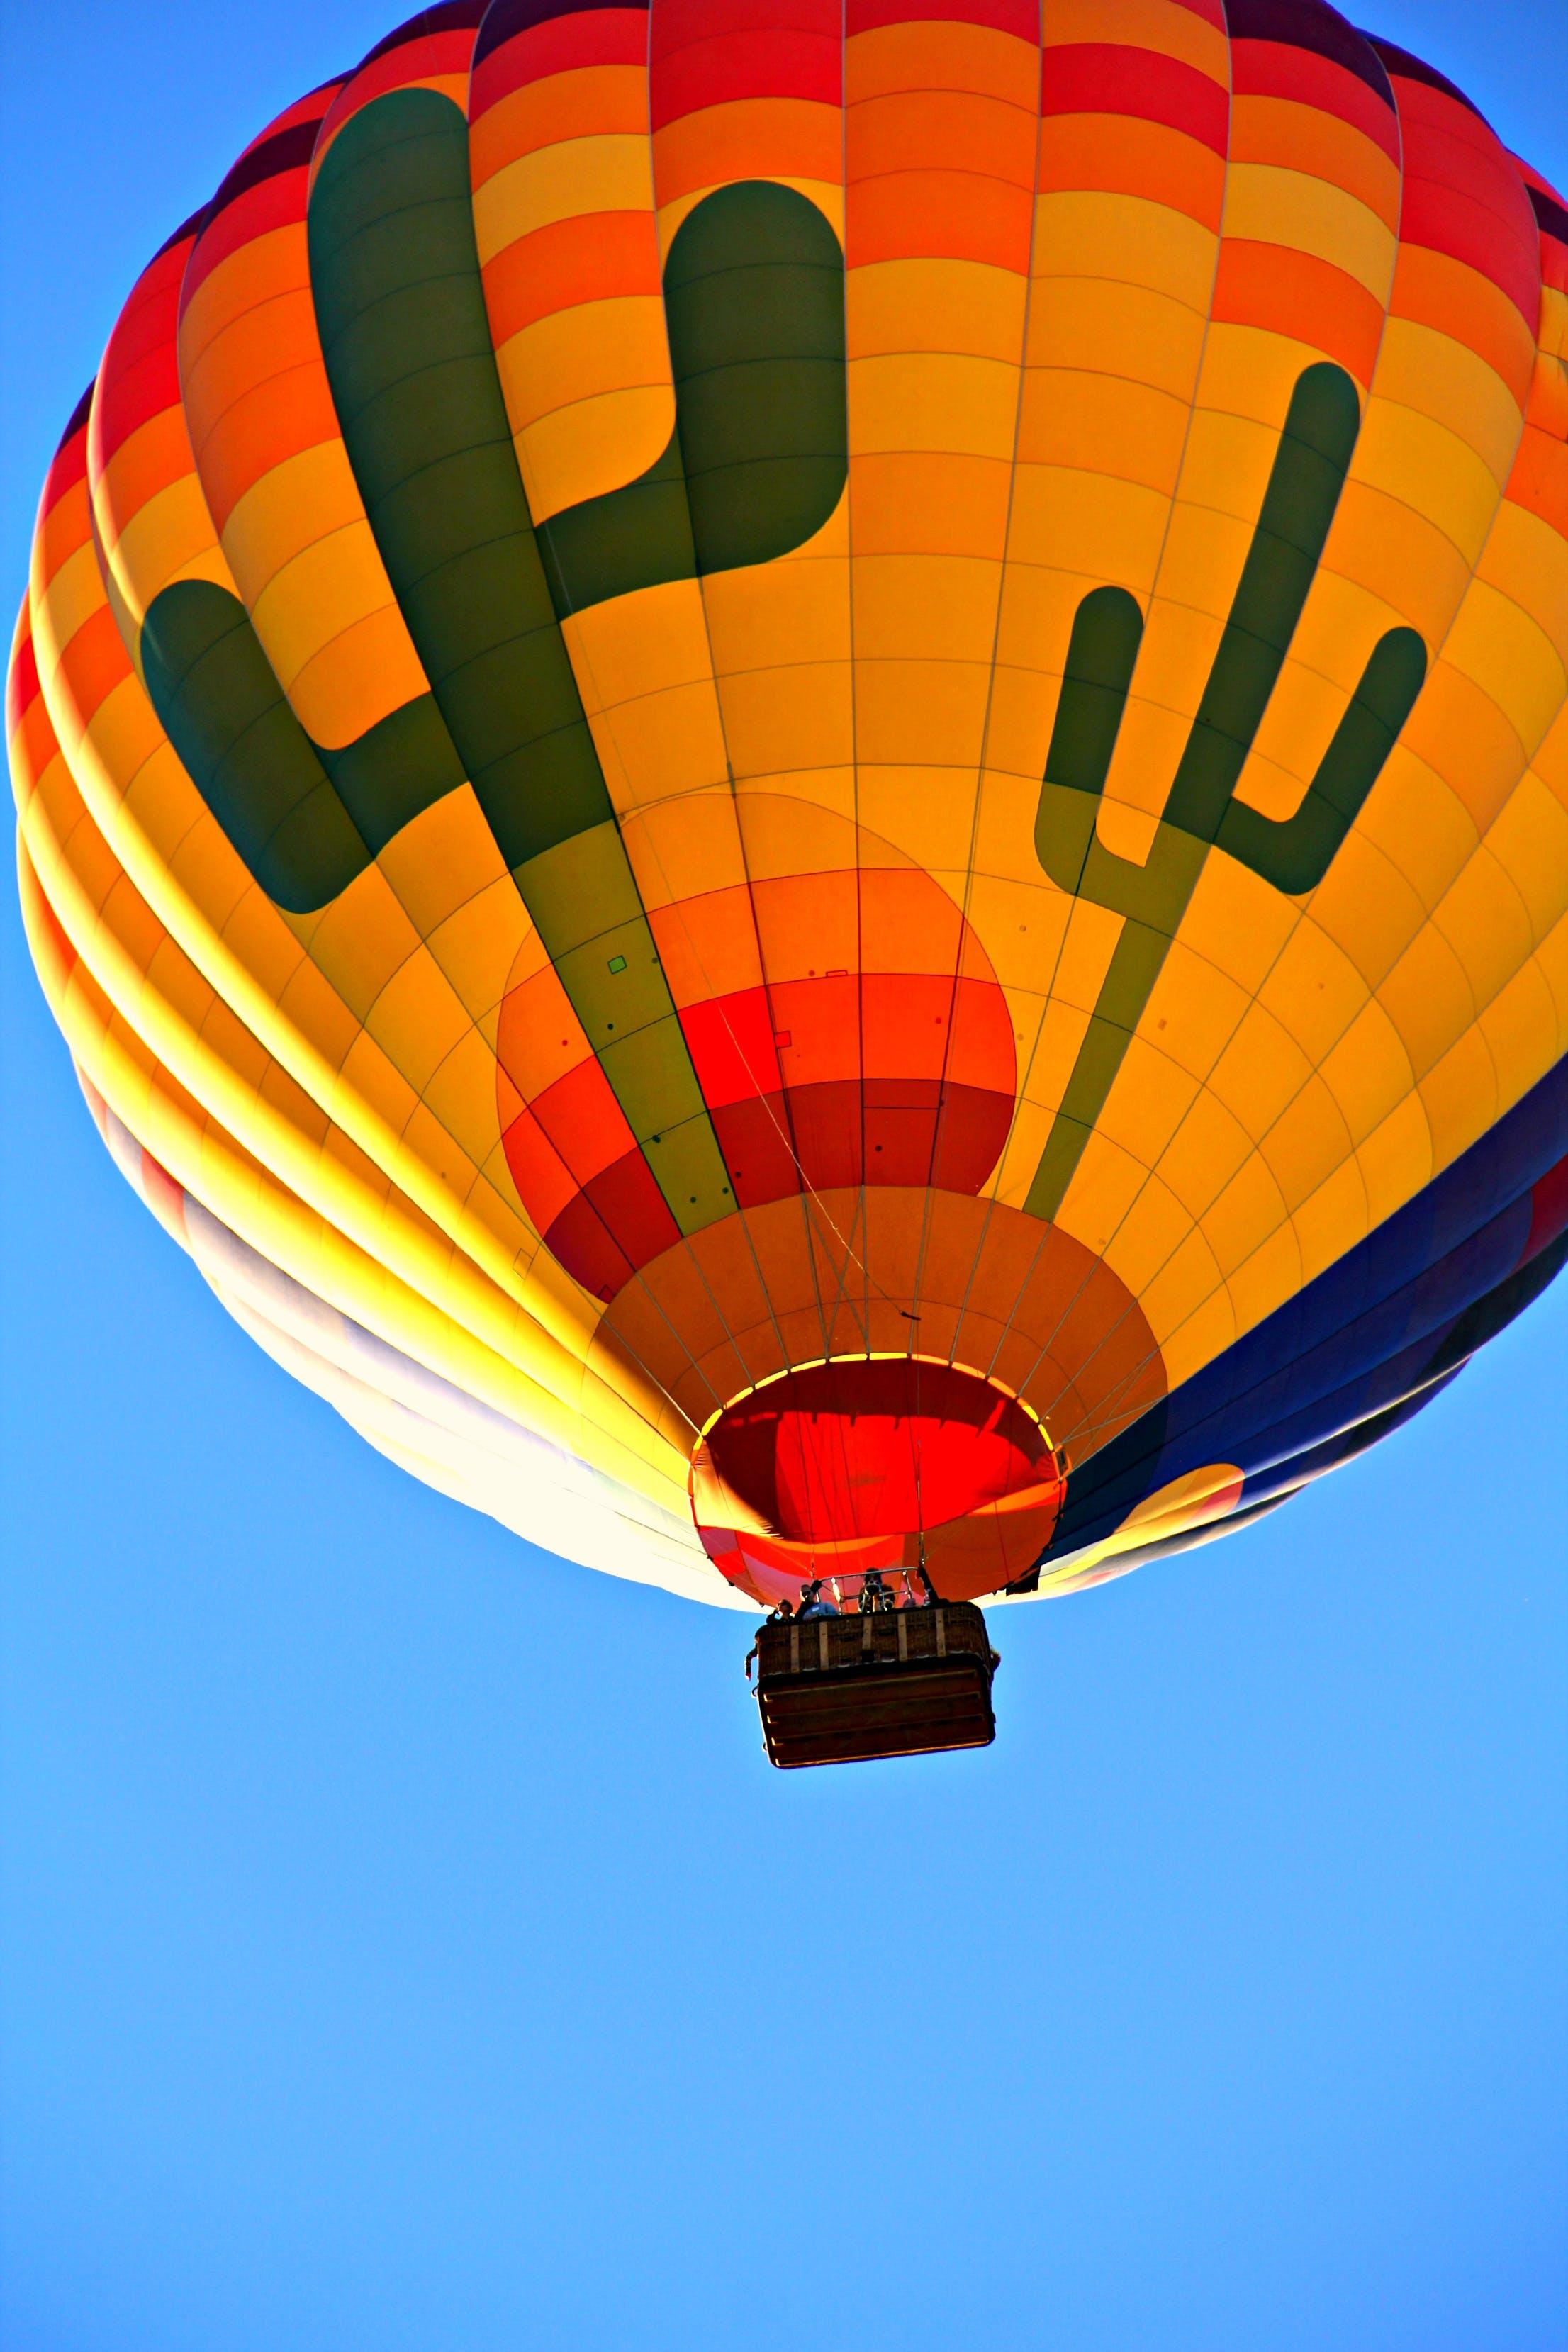 Orange Blue Yellow and Green Hot Air Balloon